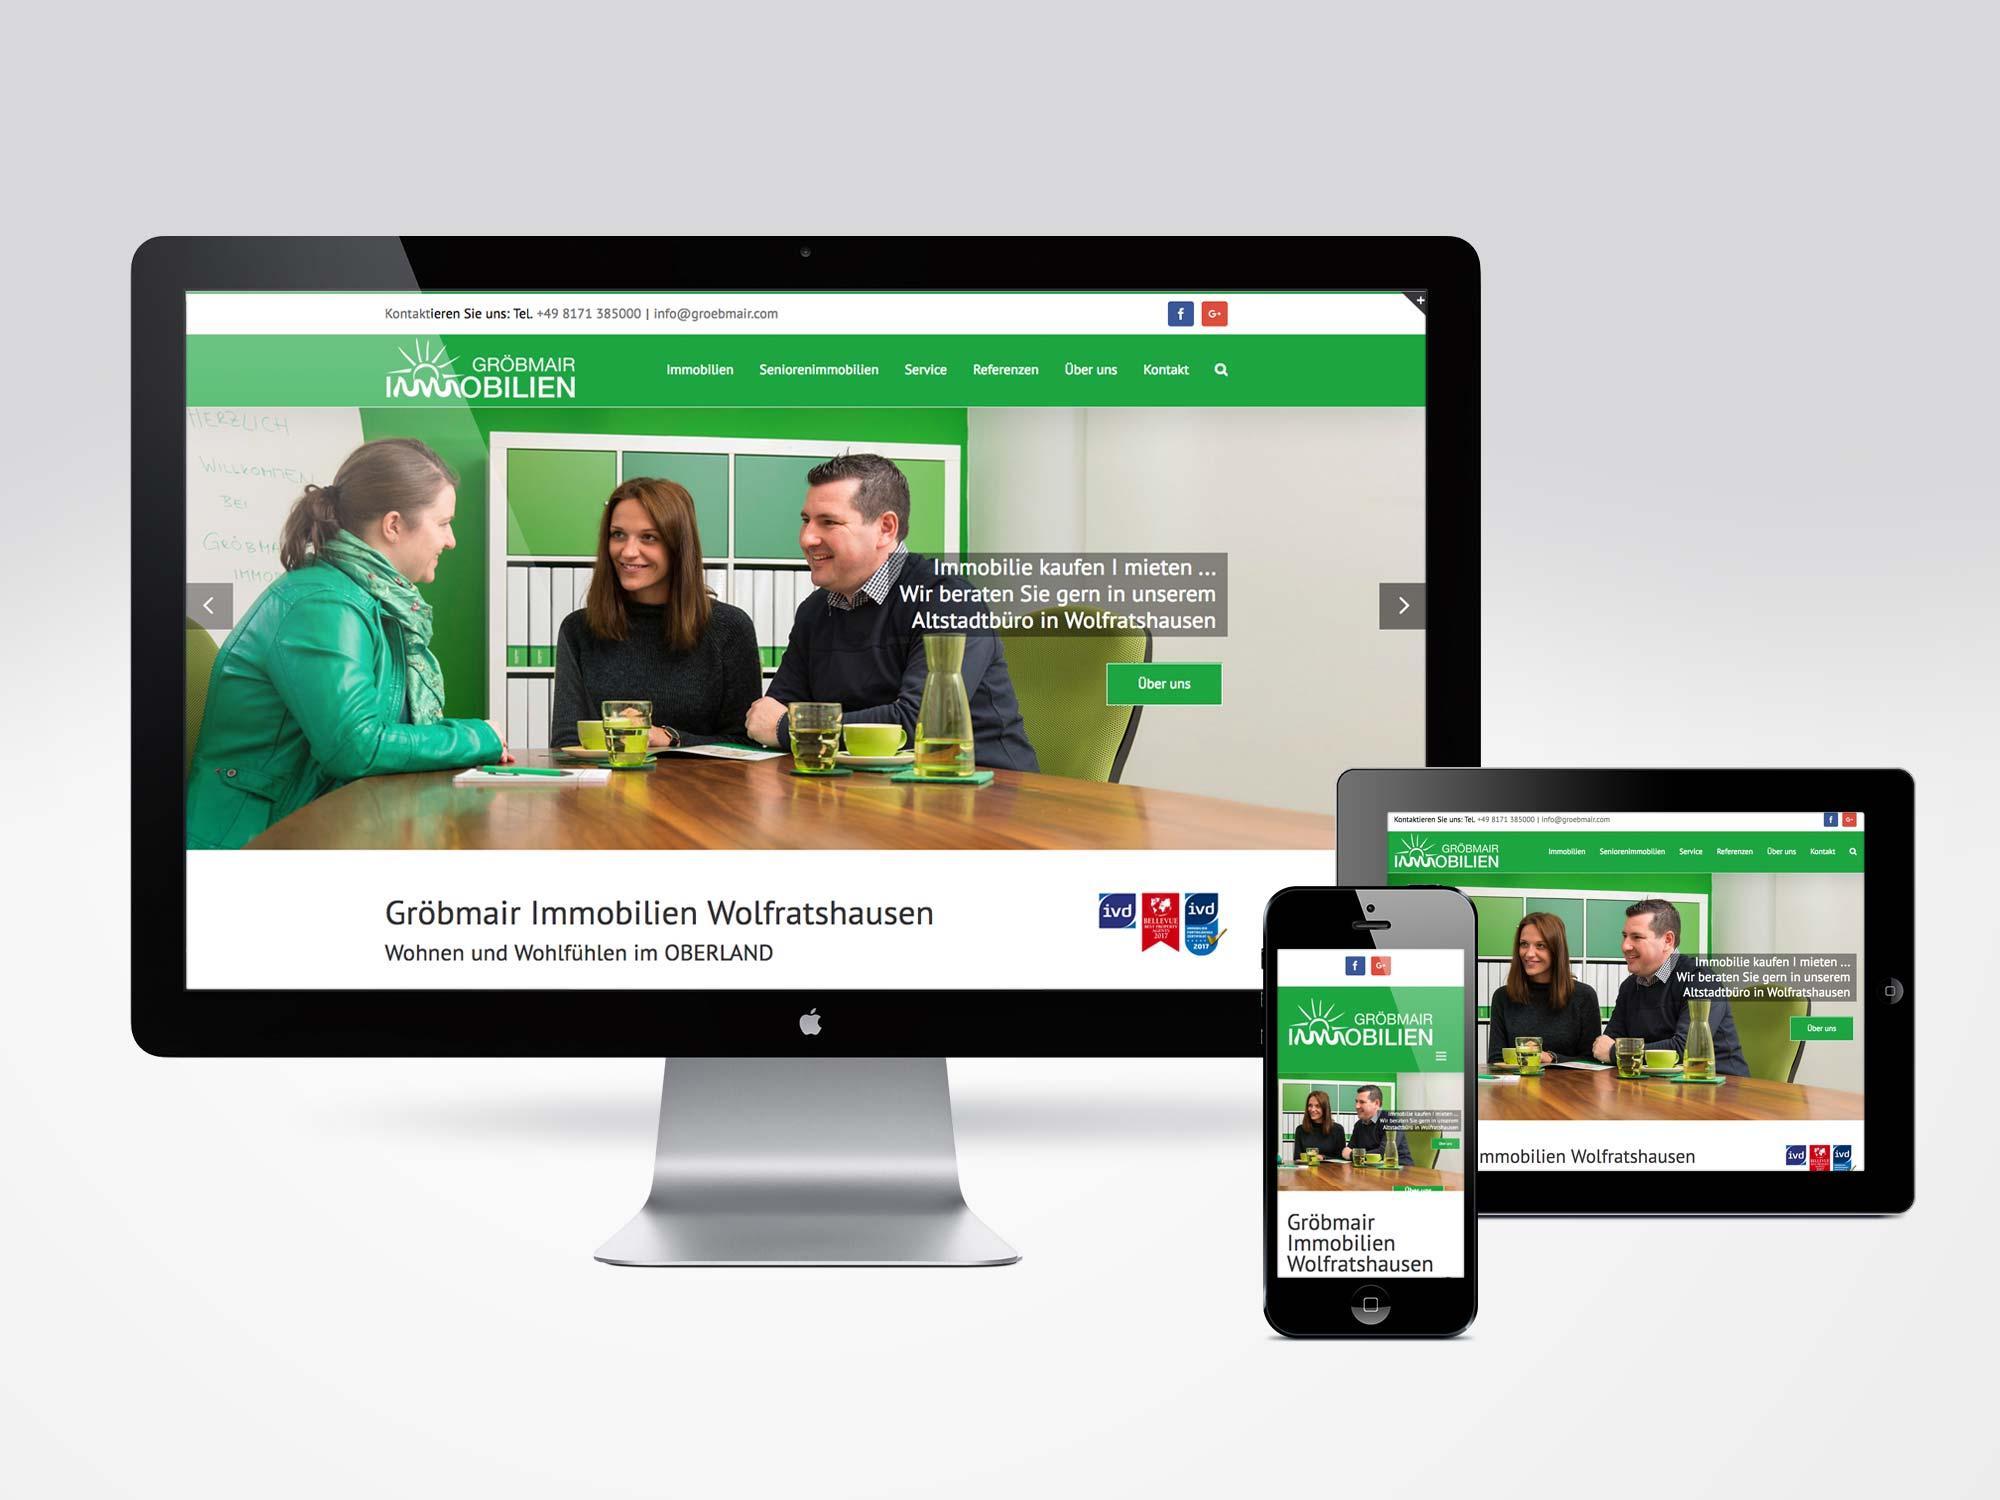 Webdesign Gröbmair Immobilien Wolfratshausen